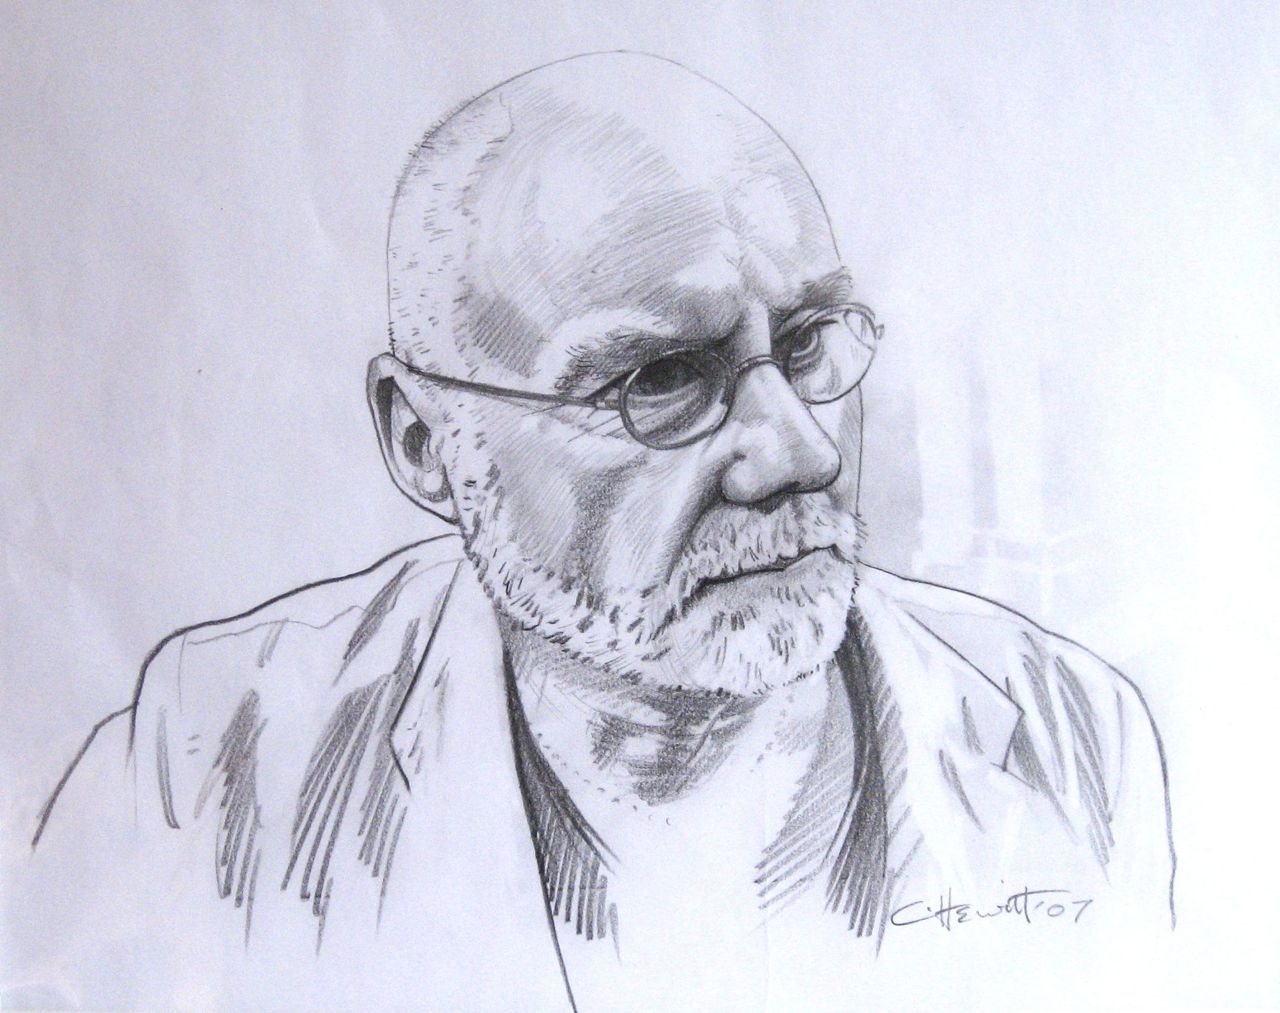 'Don' sketch for portrait.